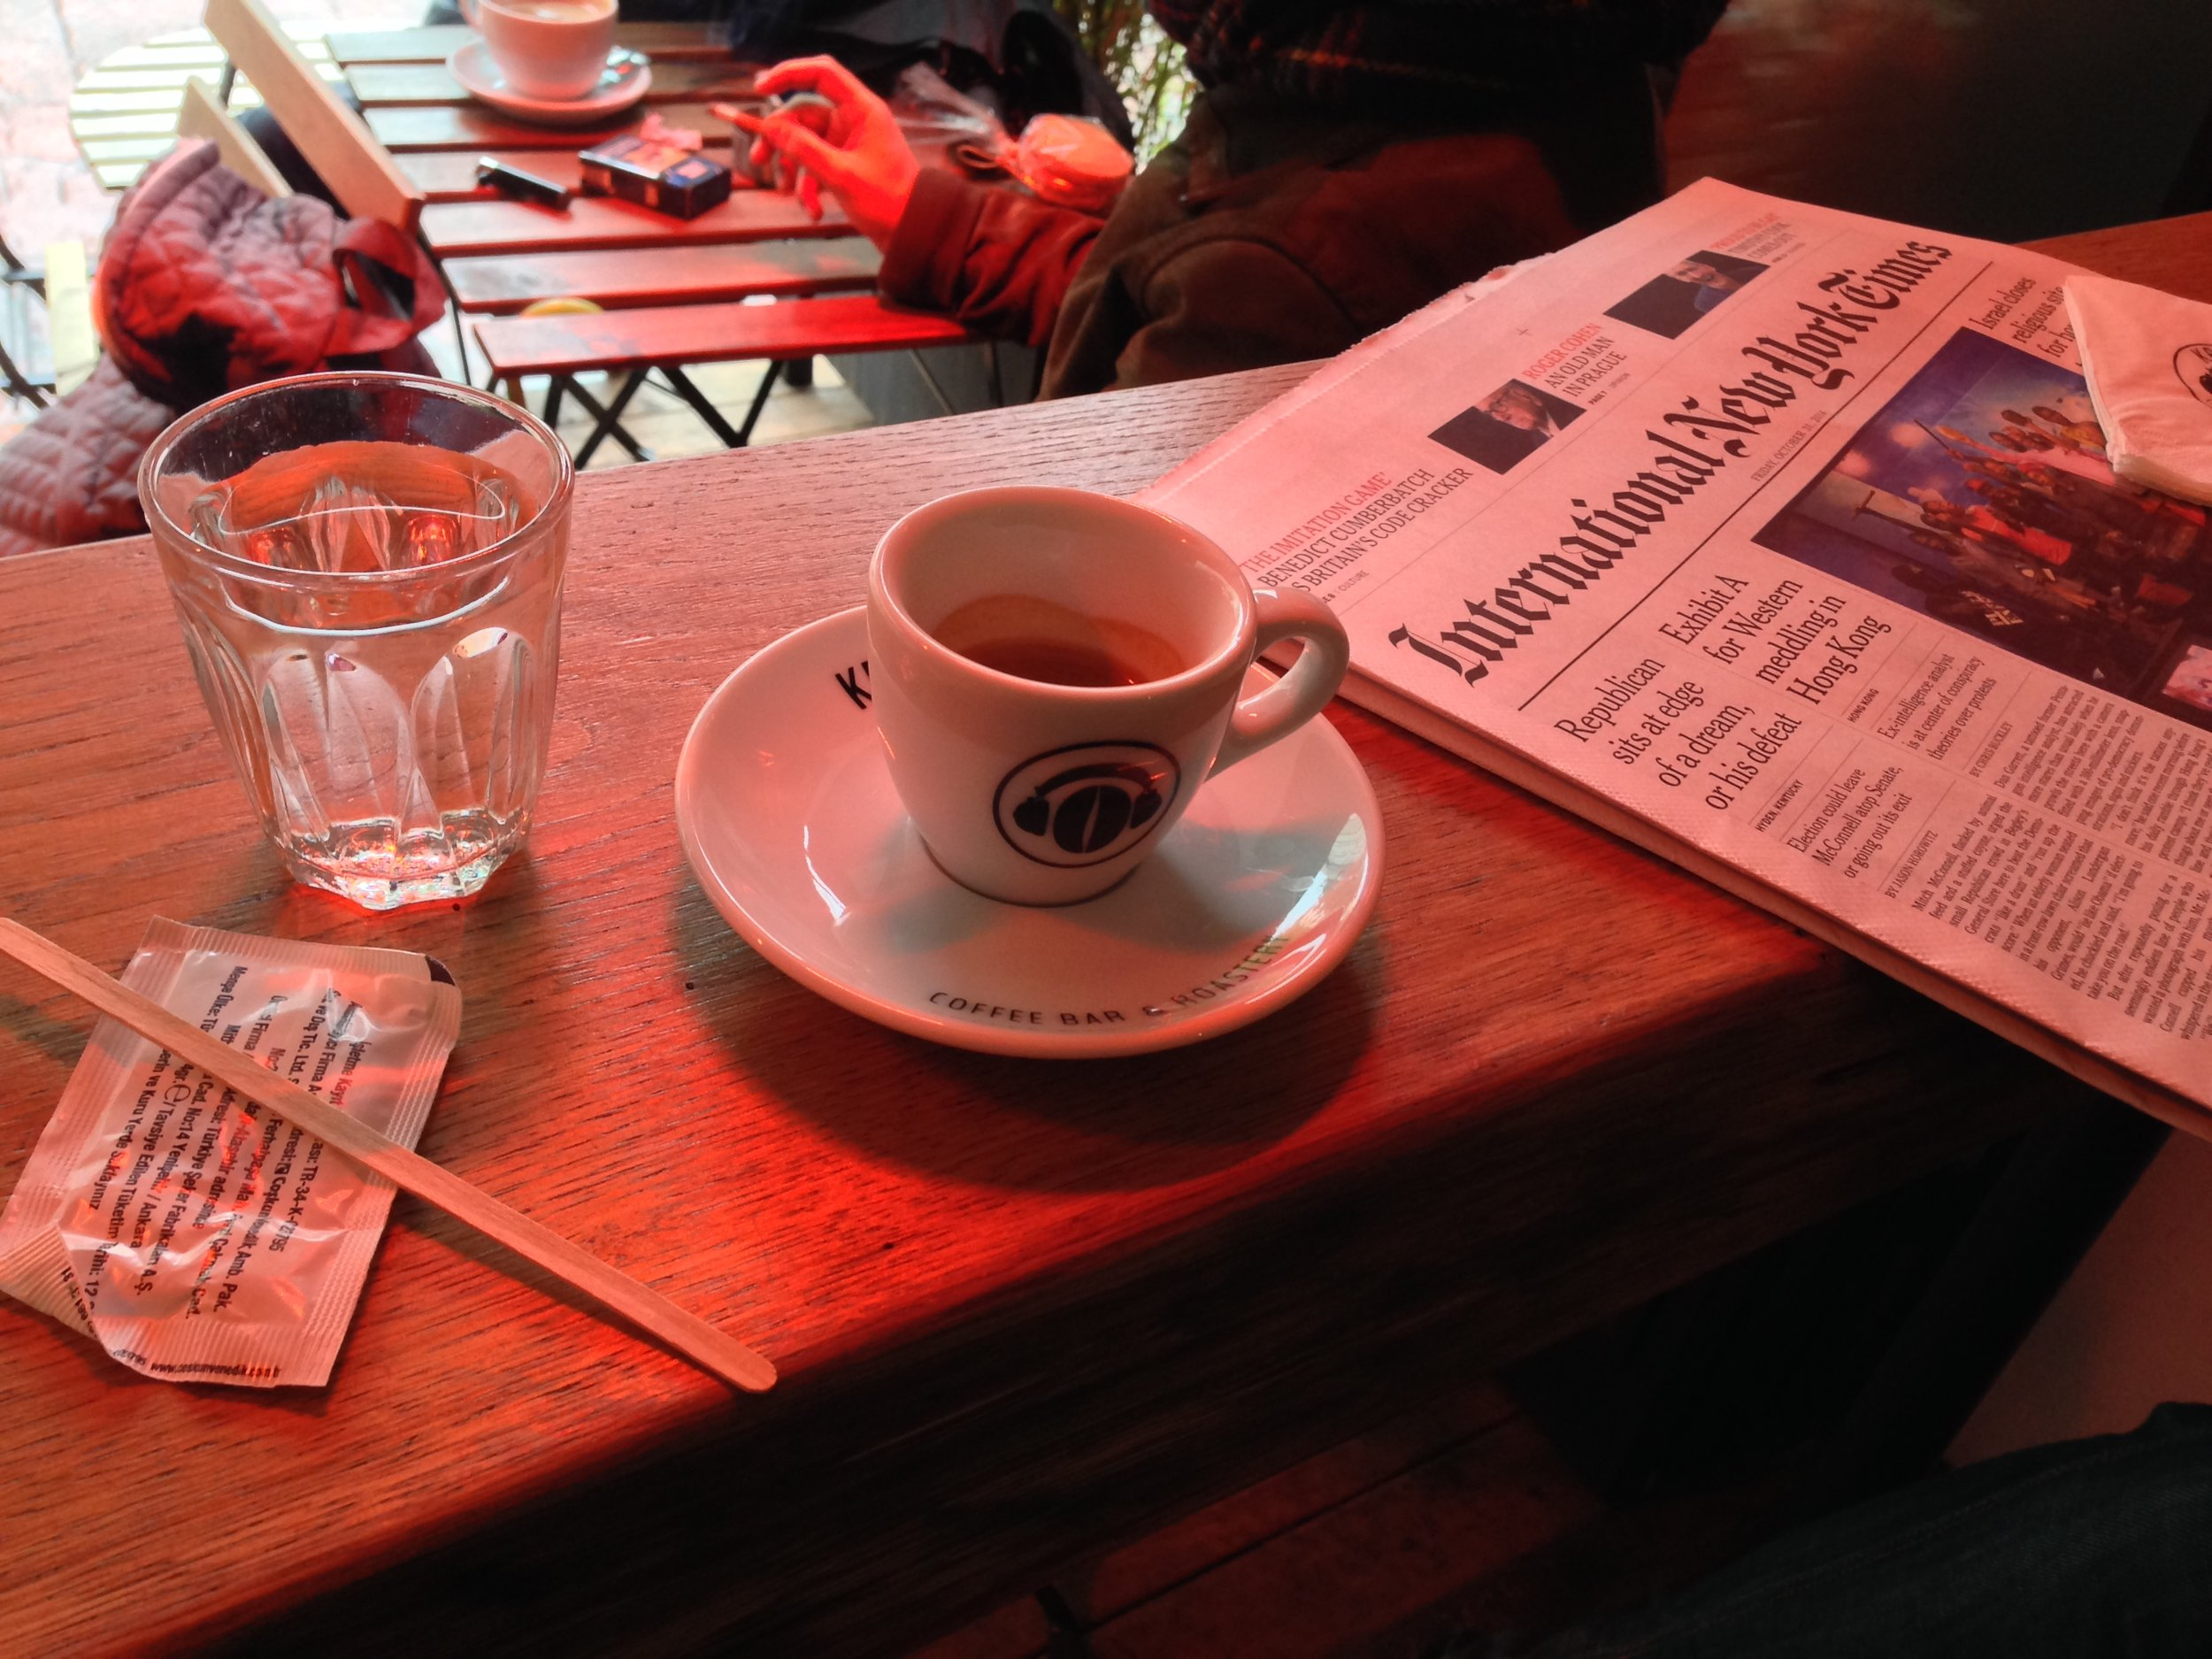 Coffee_and_newspaper.jpg